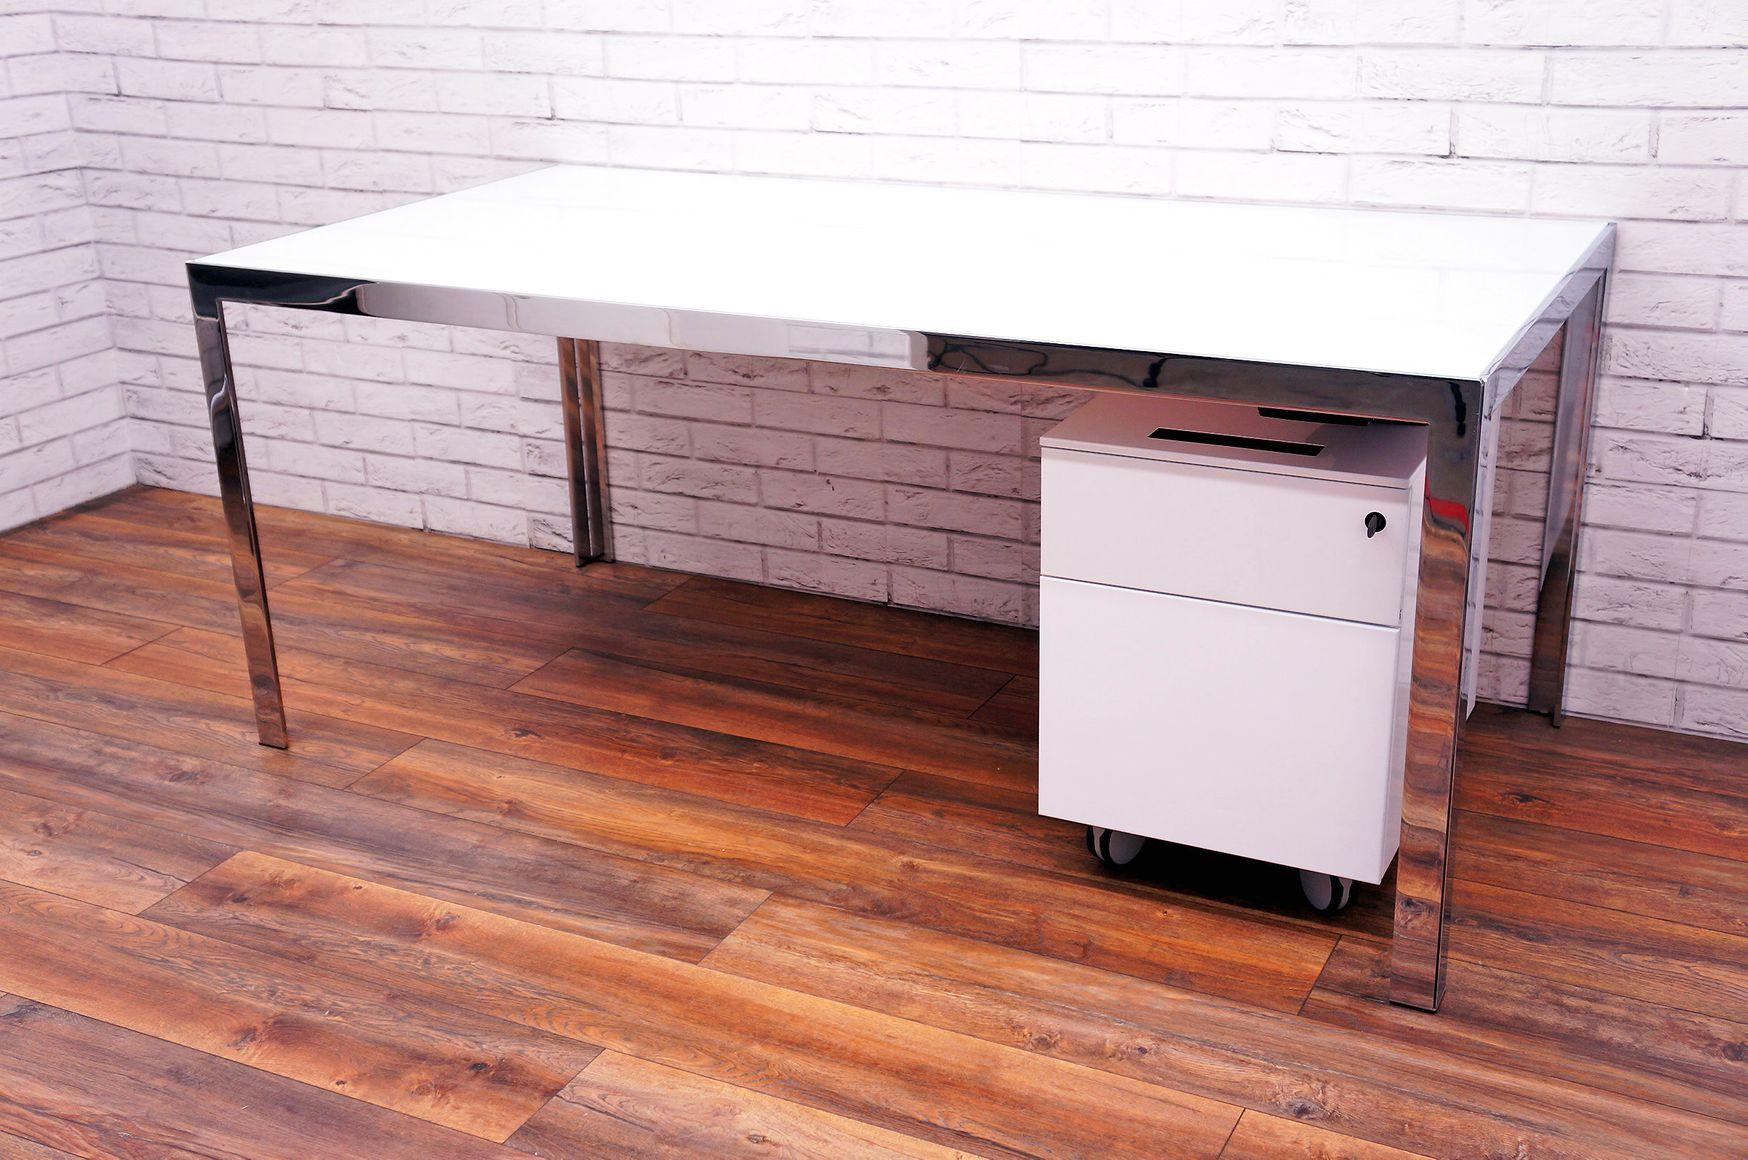 B&B Italia 'Progetto' Desk with White Glass Top and Chrome Frame/Legs